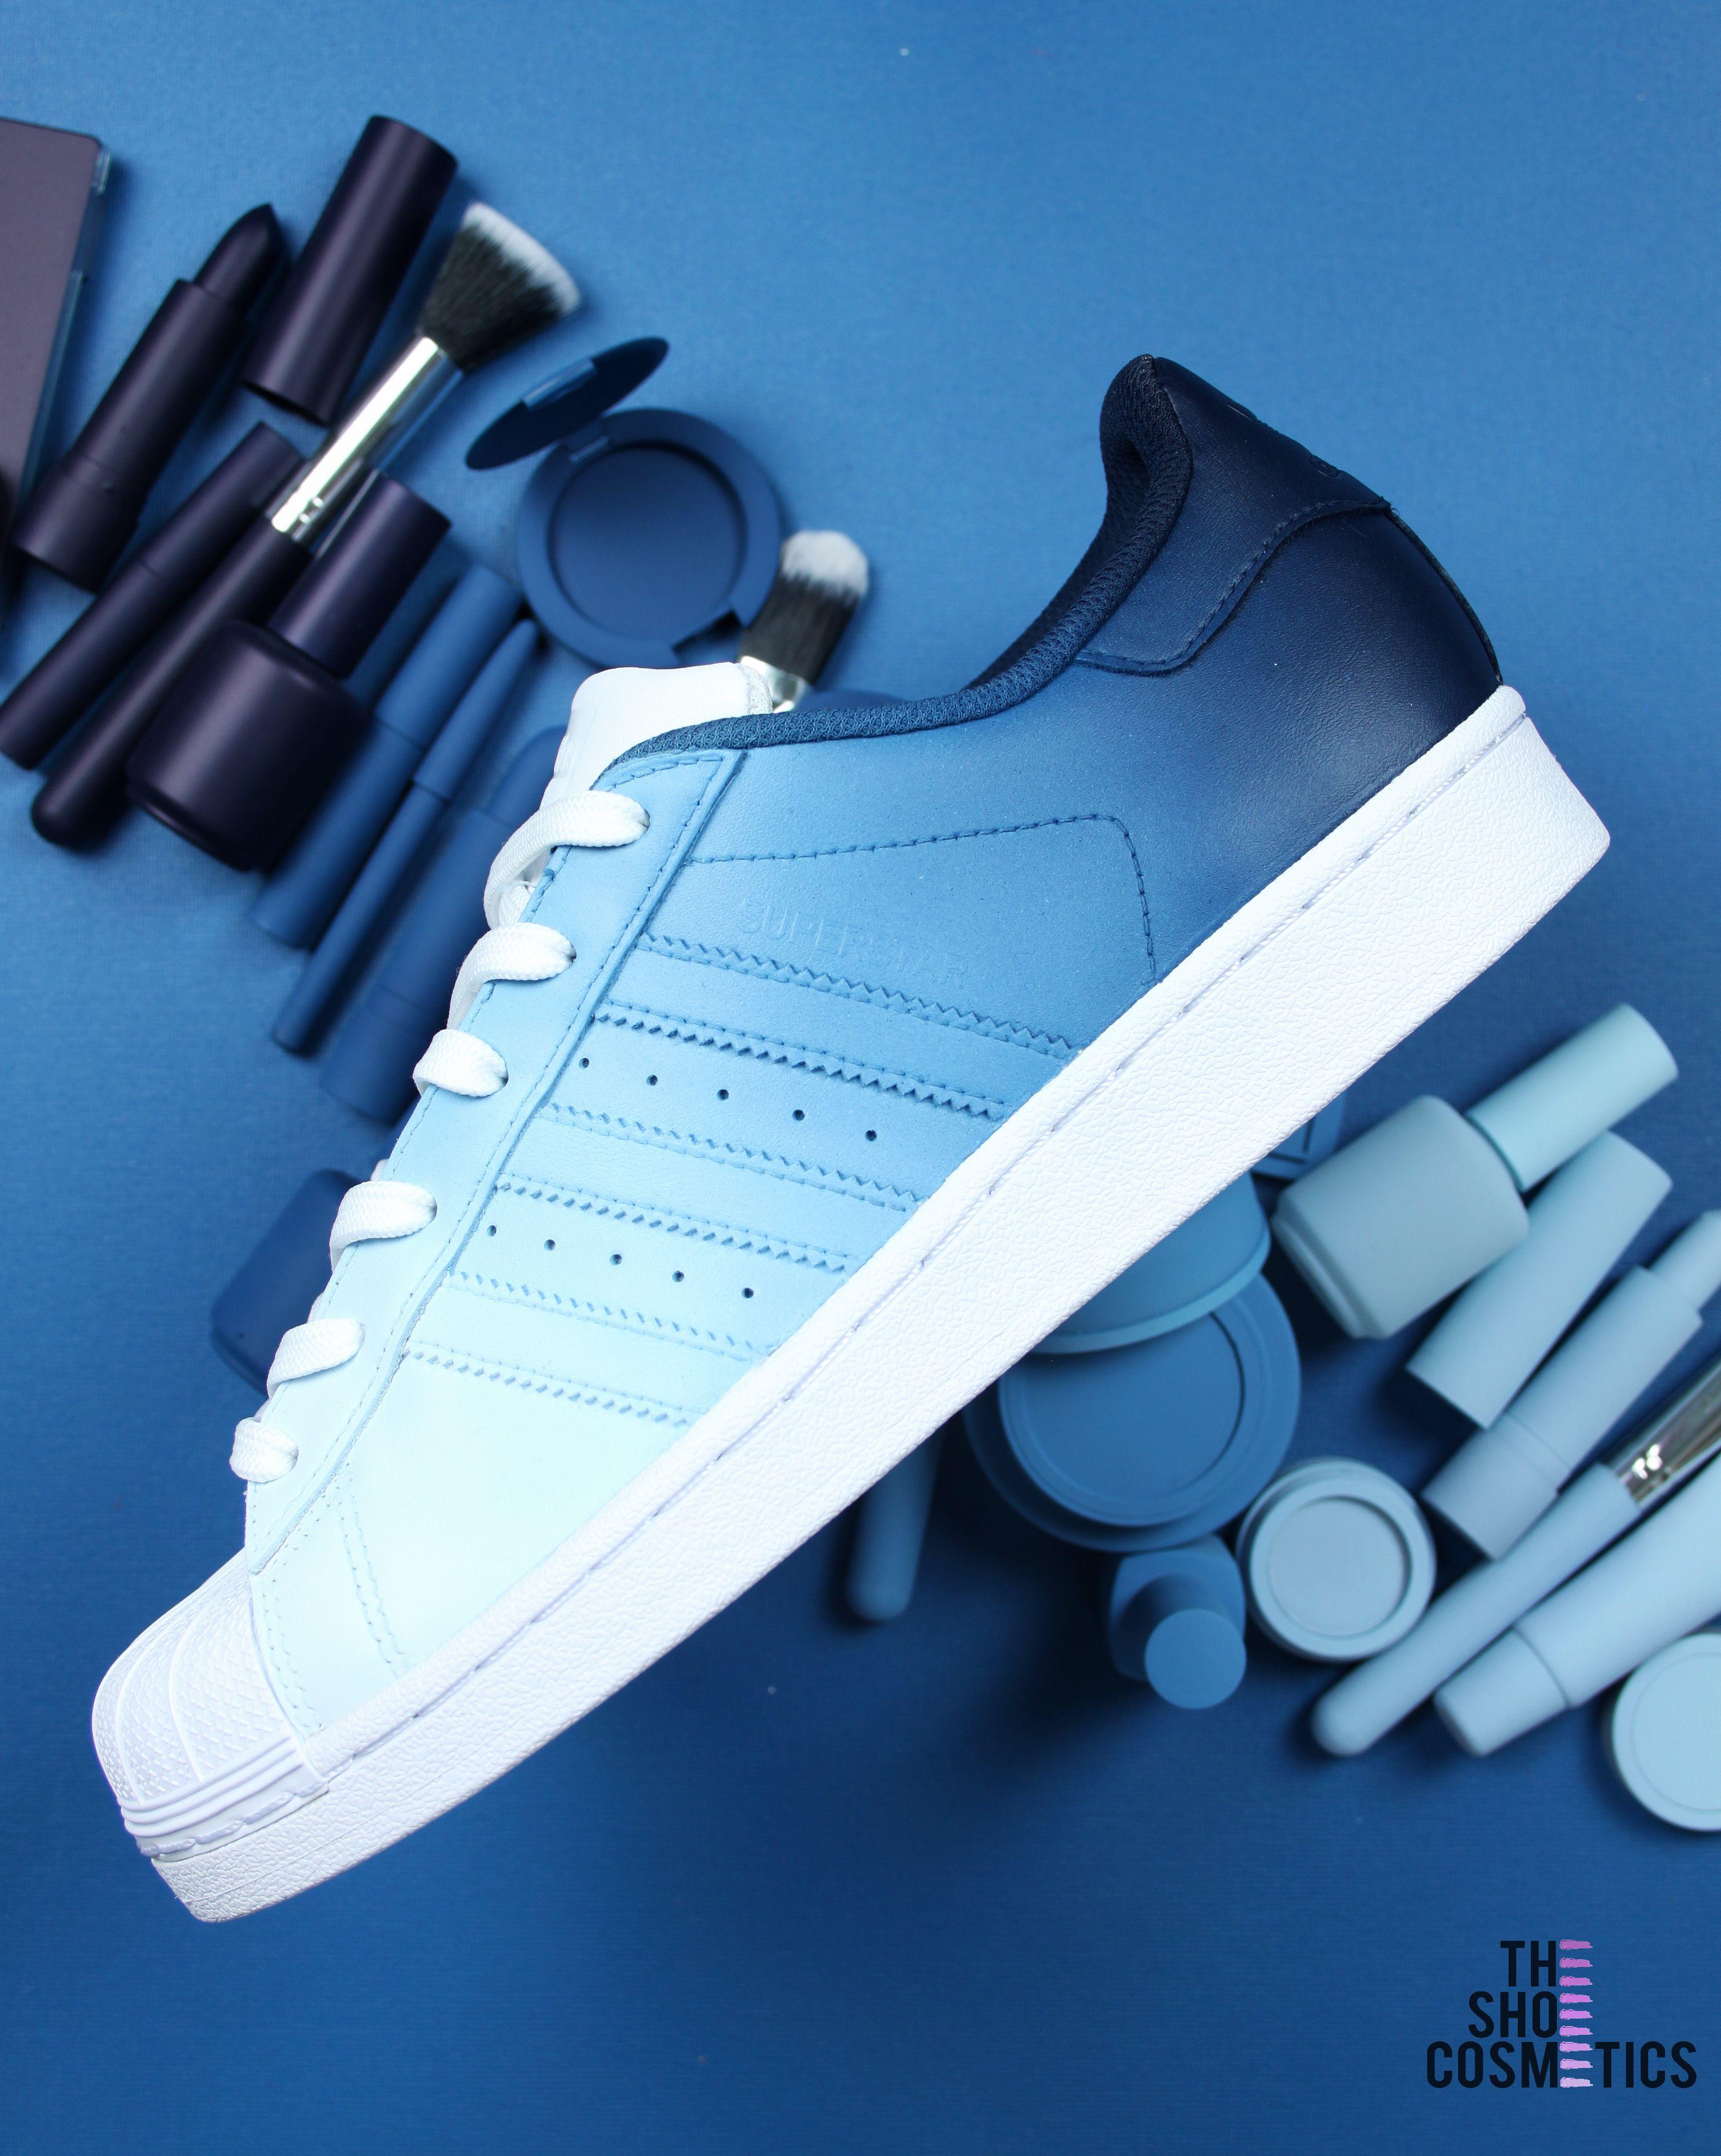 Custom Ombre 2019Cars En Superstar Navy Blue Adidas Shoes 0kX8nZwPNO